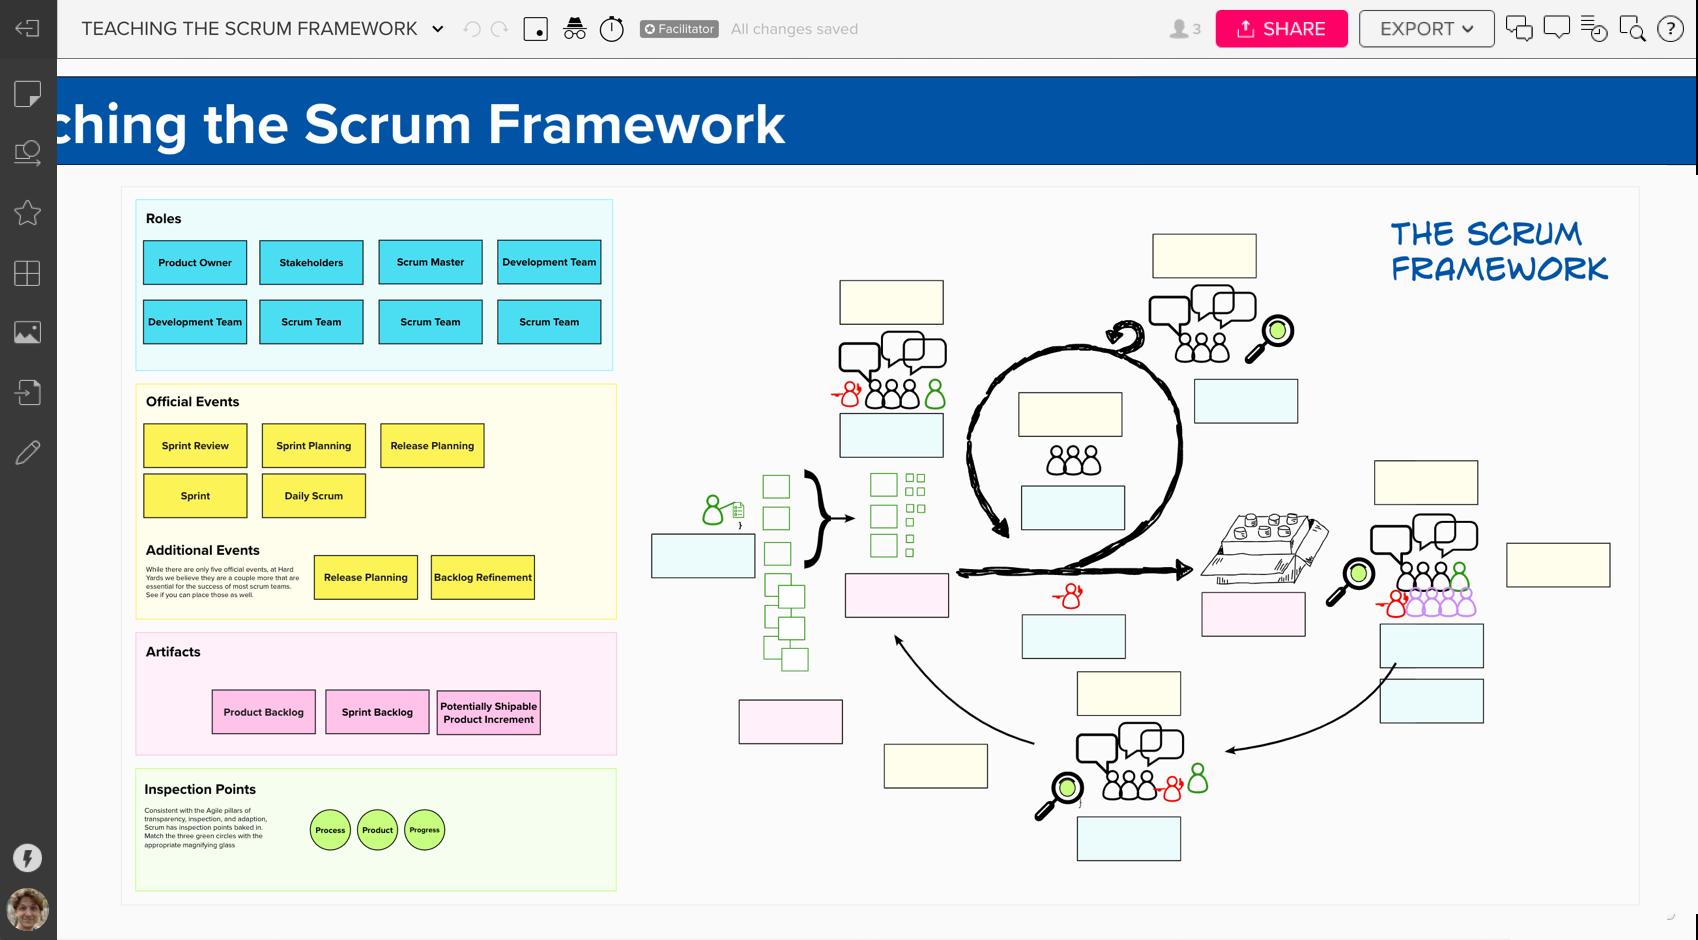 Teaching the Scrum Framework